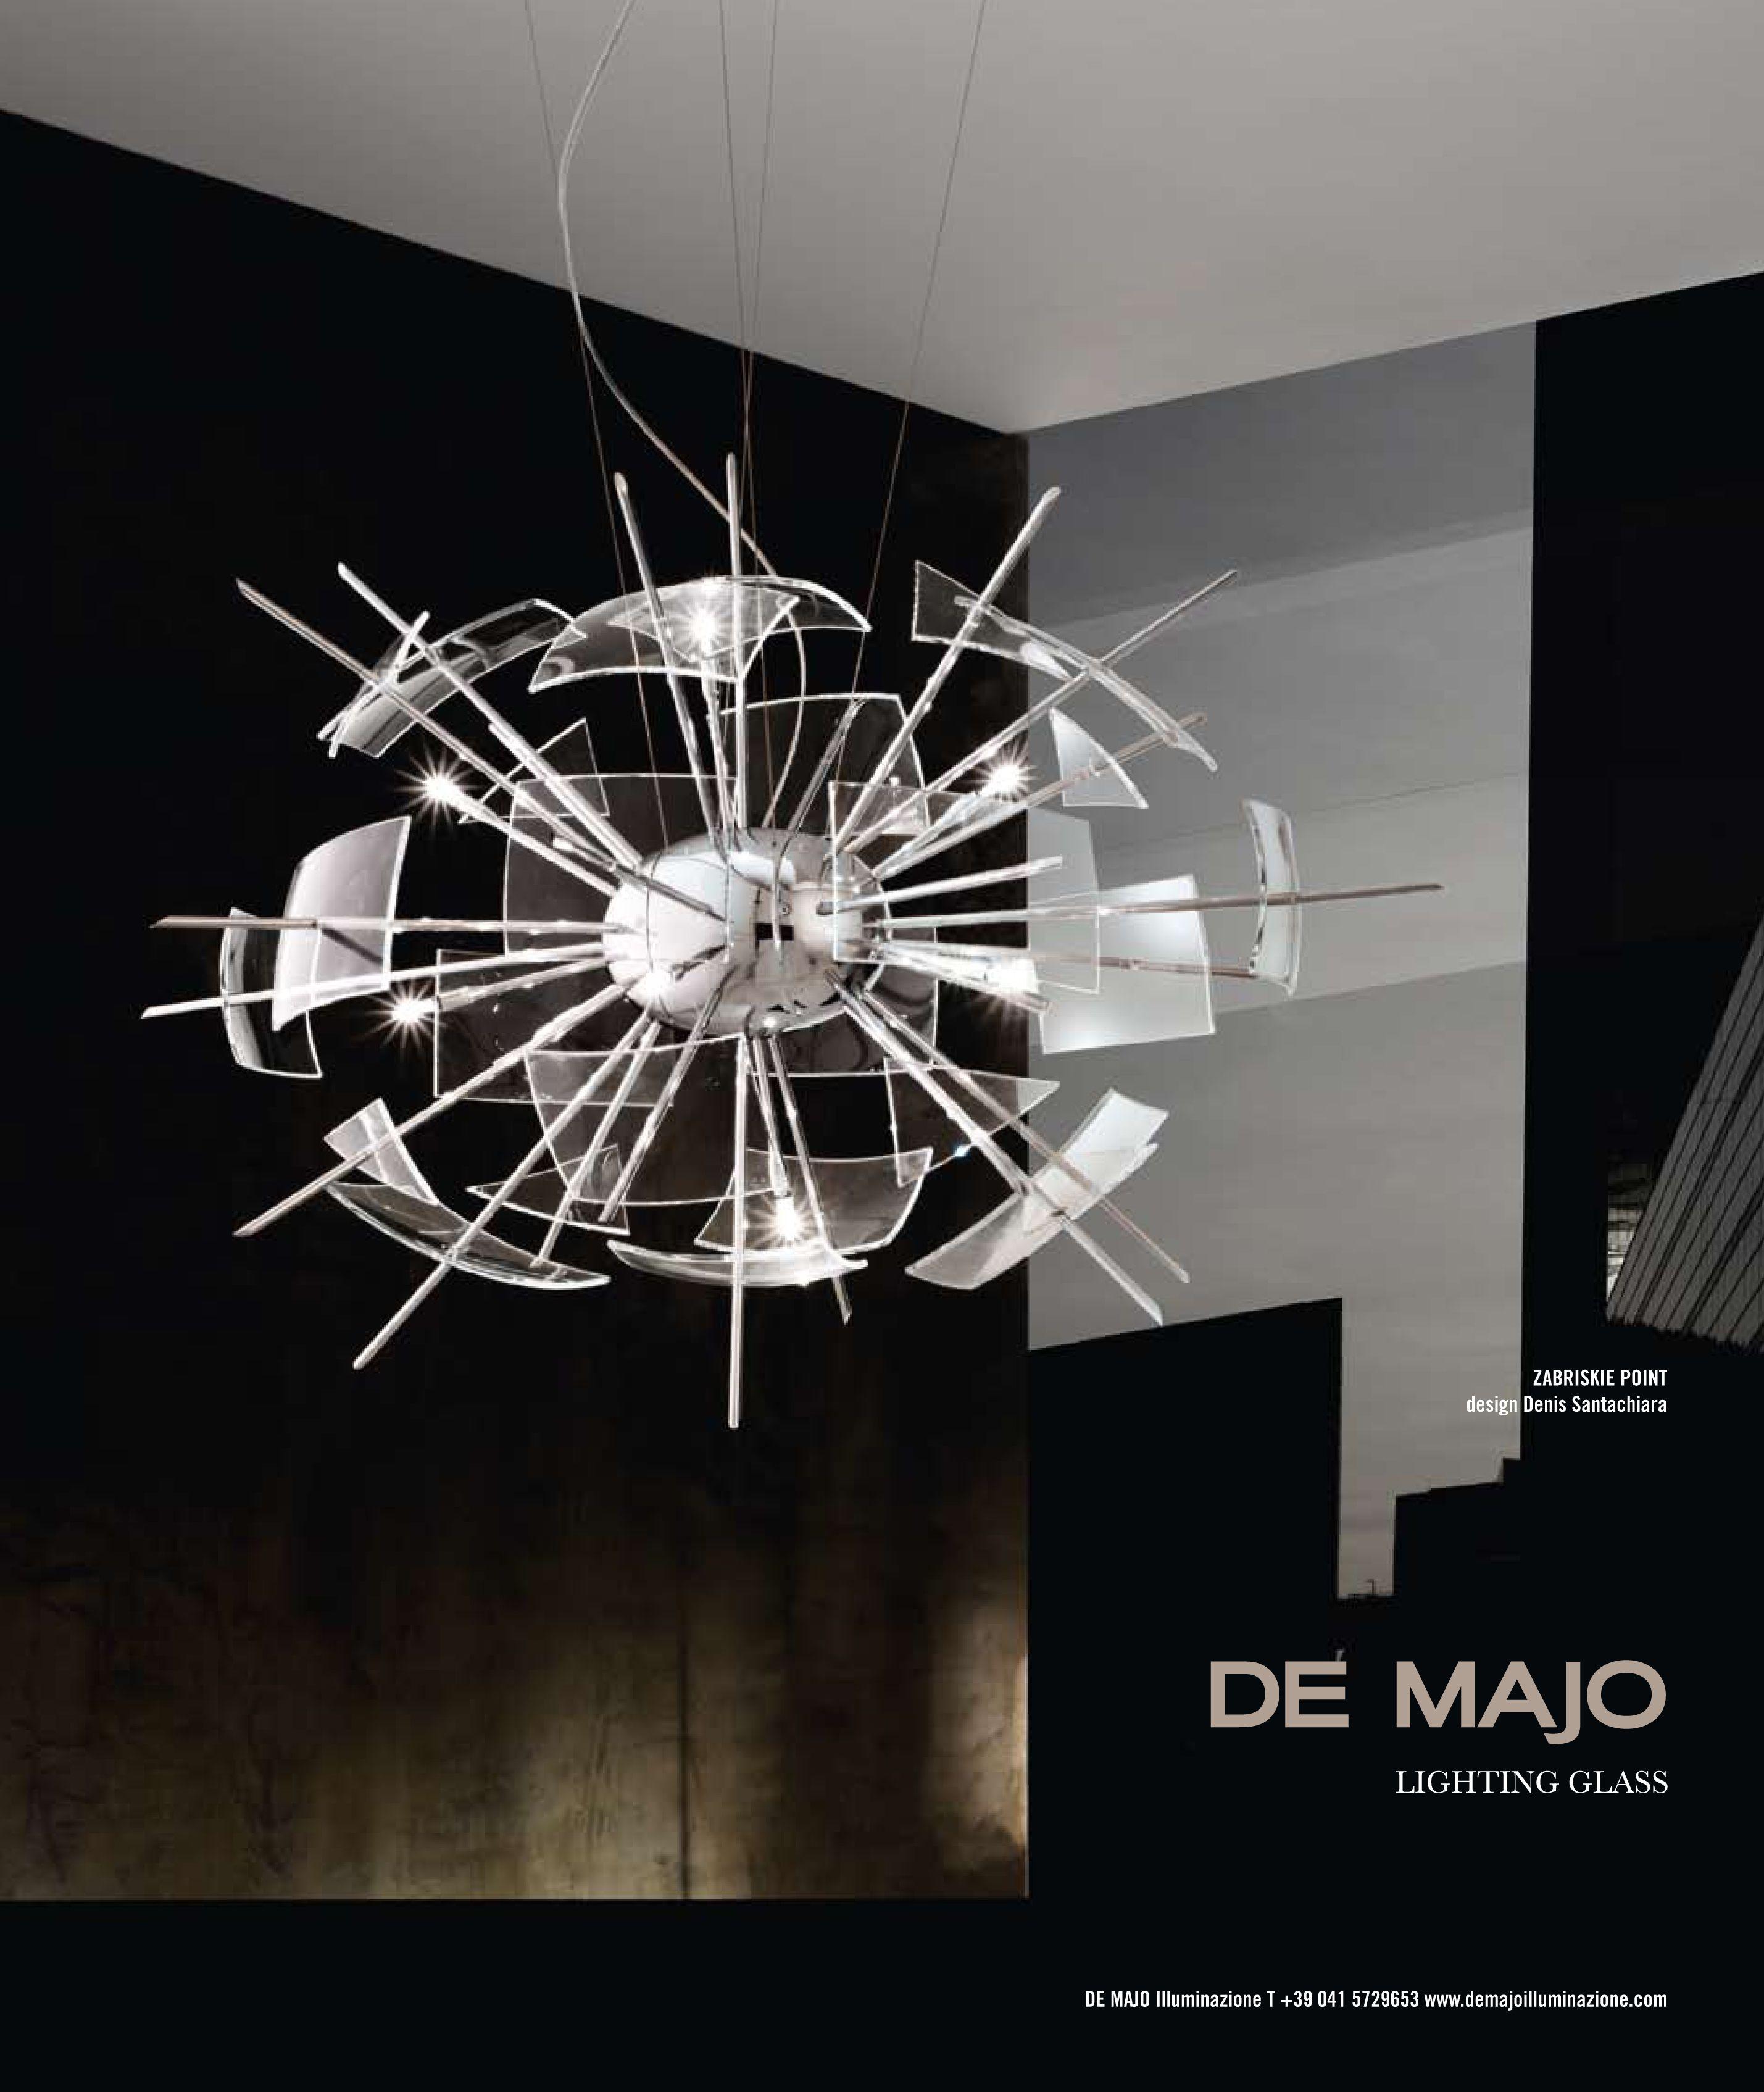 Advertising Campaigns On Murano Chandeliers De Majo